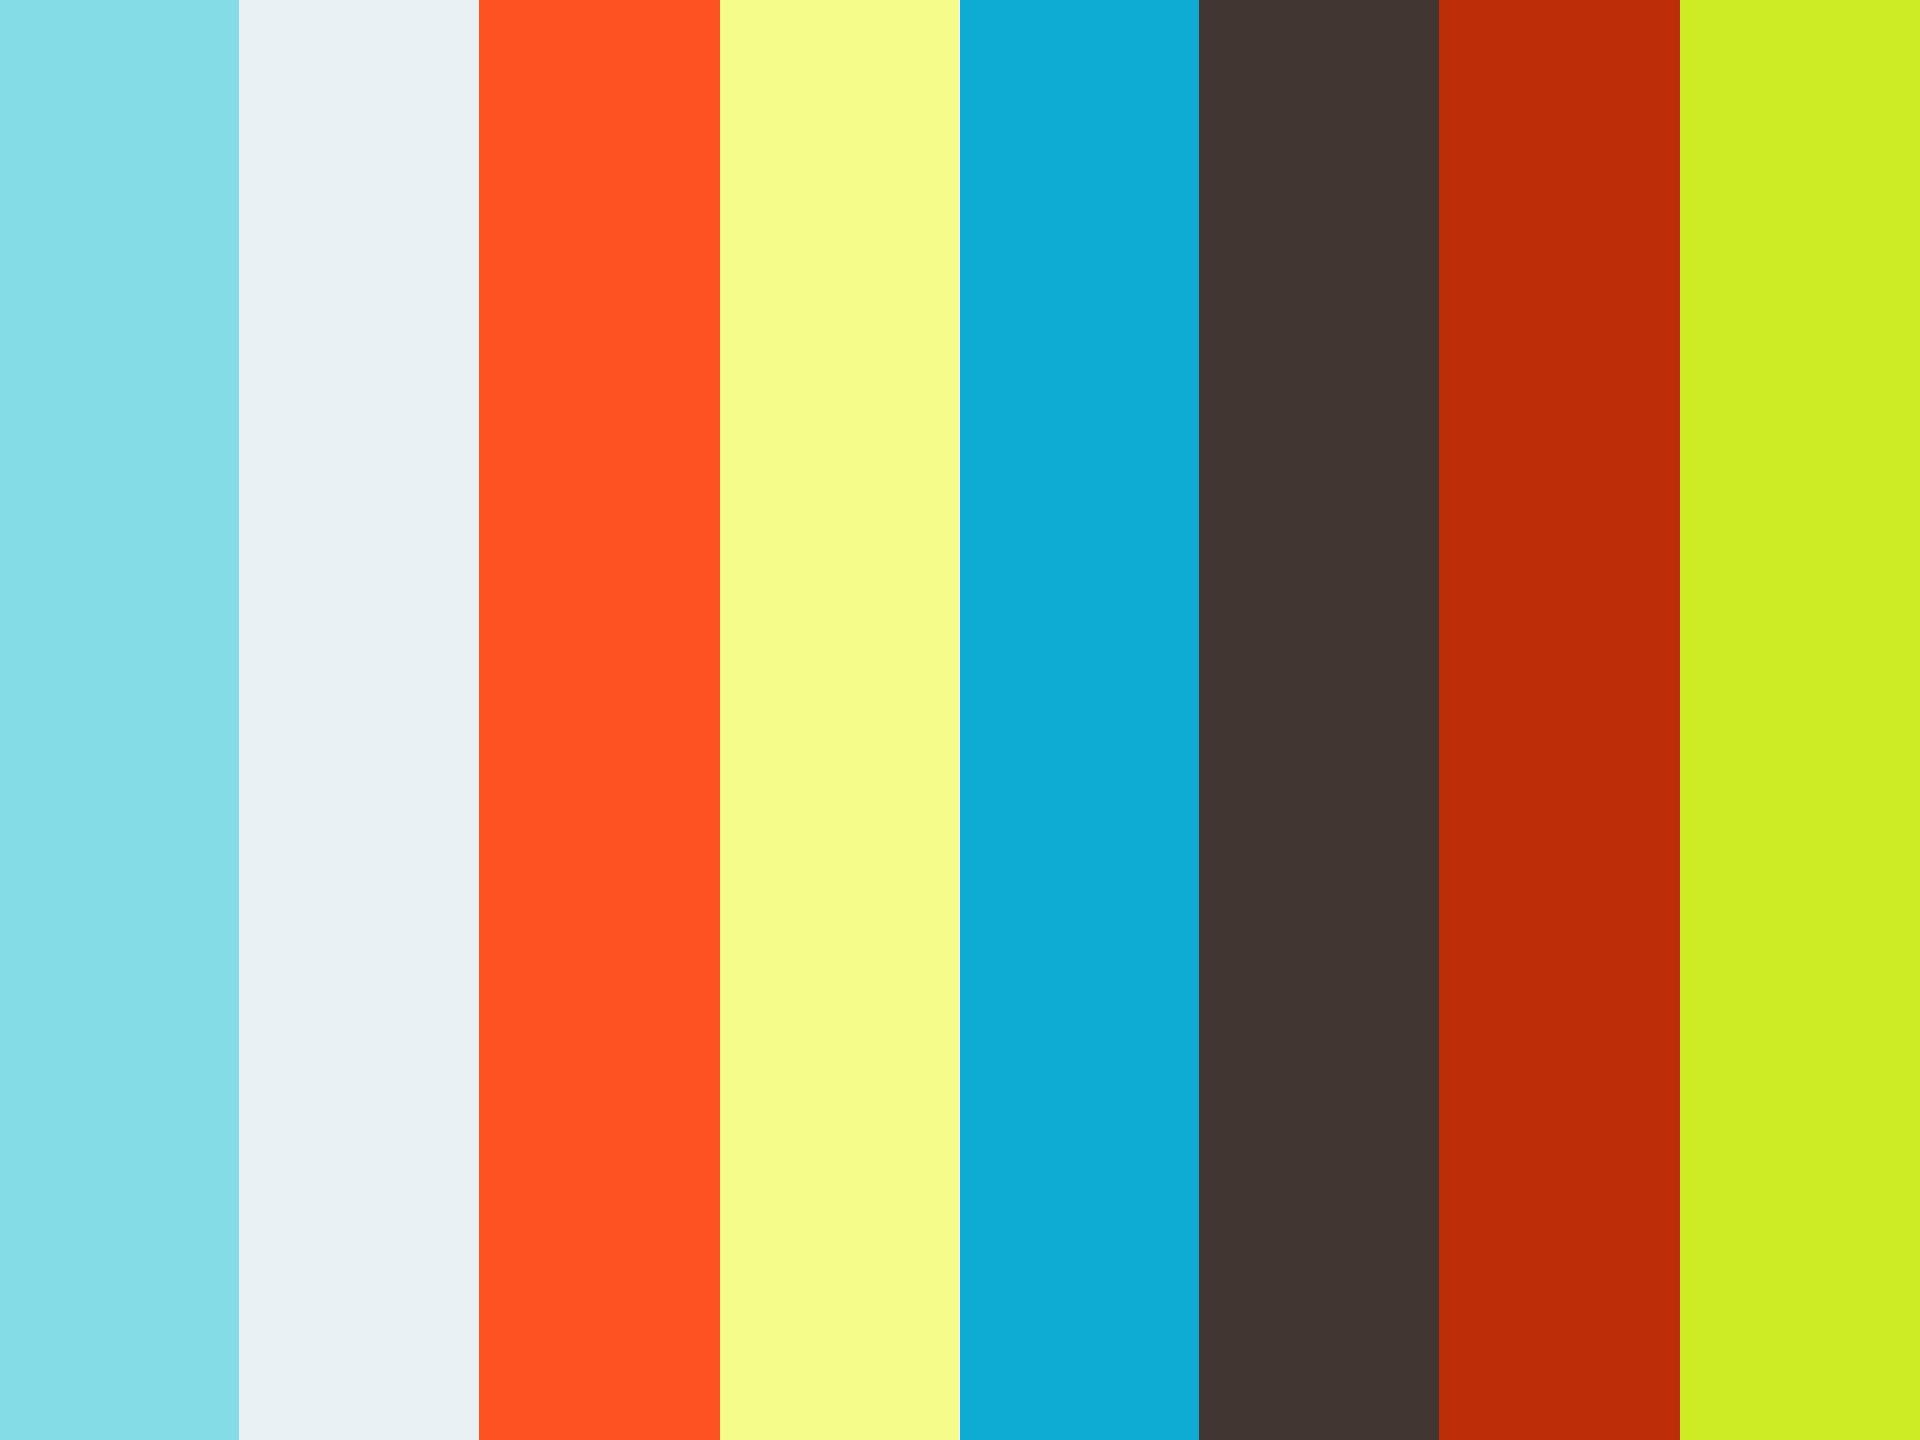 https://i.vimeocdn.com/filter/overlay?src0=https%3A%2F%2Fi.vimeocdn.com%2Fvideo%2F752639506_1280x720.webp&src1=https%3A%2F%2Ff.vimeocdn.com%2Fimages_v6%2Fshare%2Fplay_icon_overlay.png